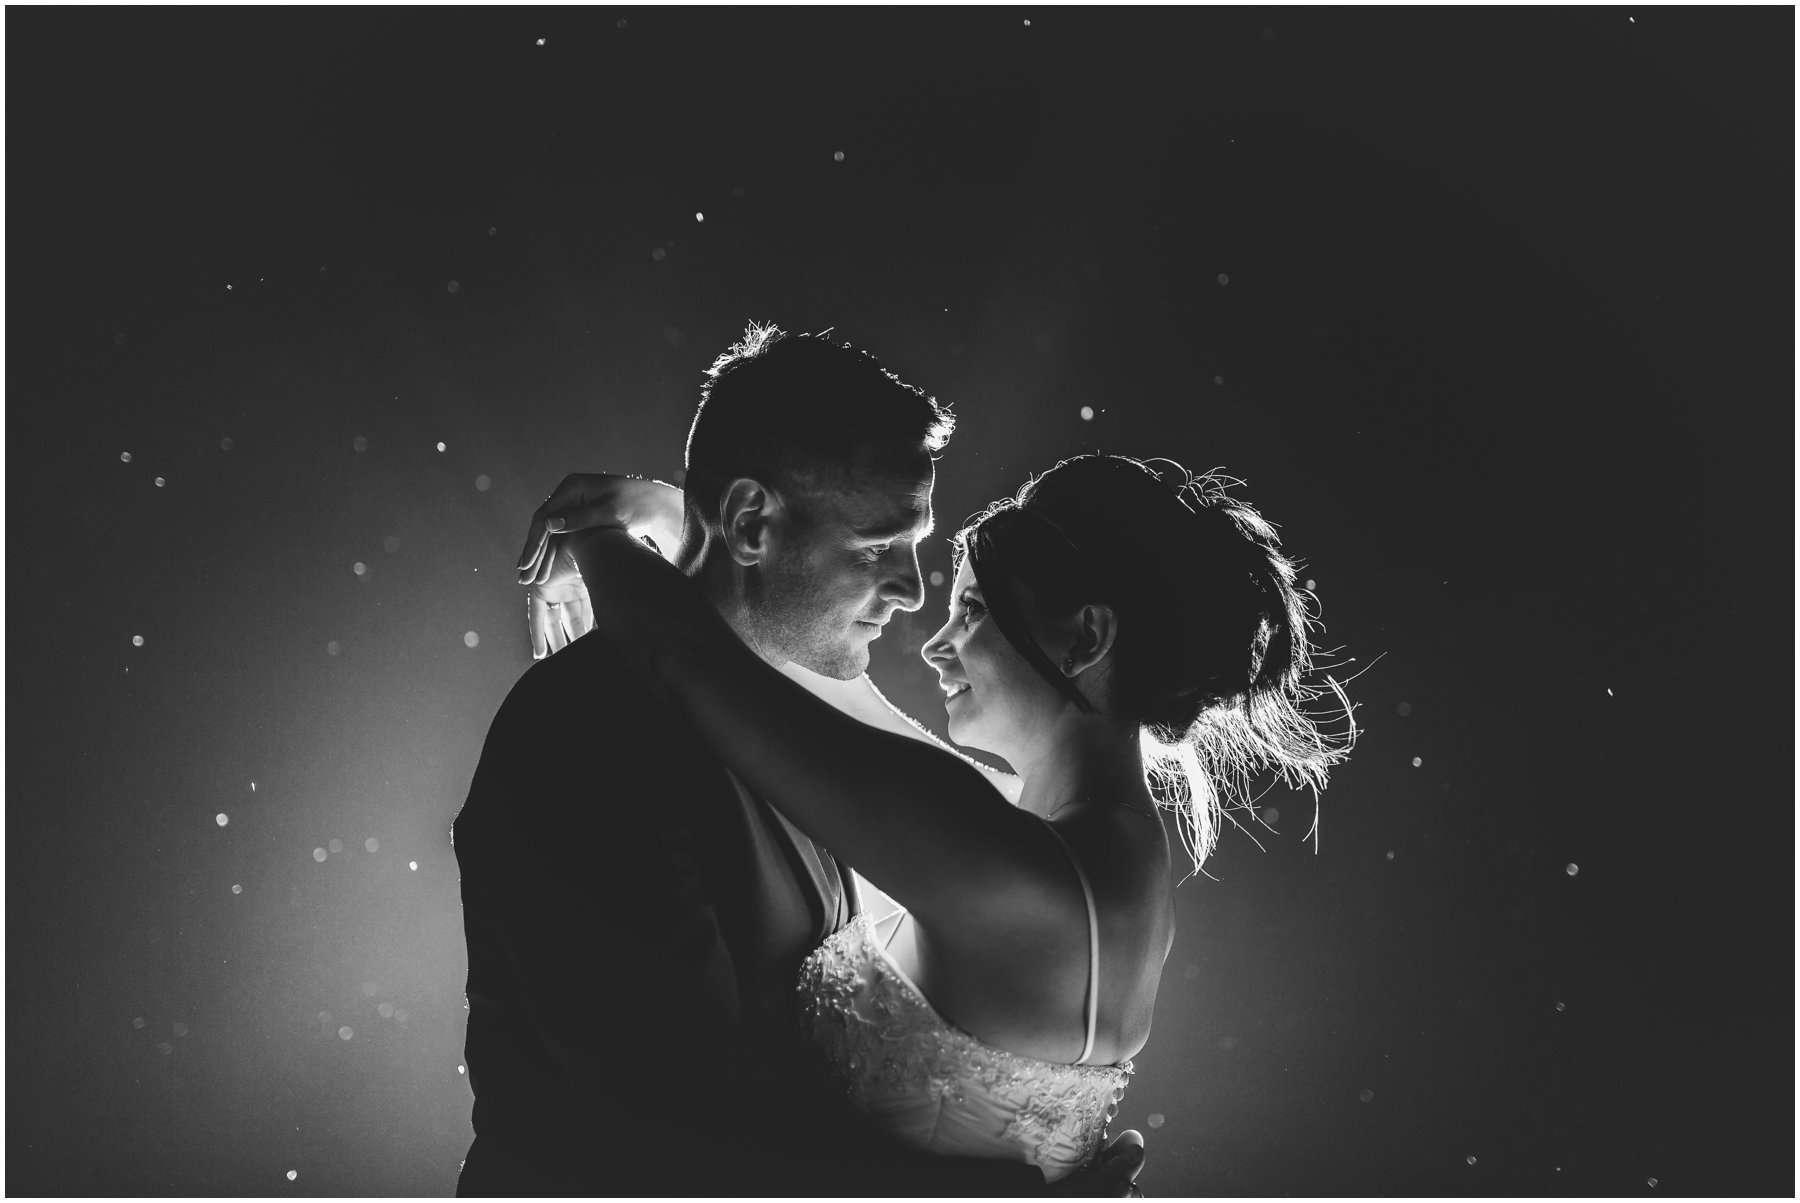 SOUTHWOOD HALL WEDDING - TRACEY AND JONATHAN - NORFOLK WEDDING PHOTOGRAPHER 2